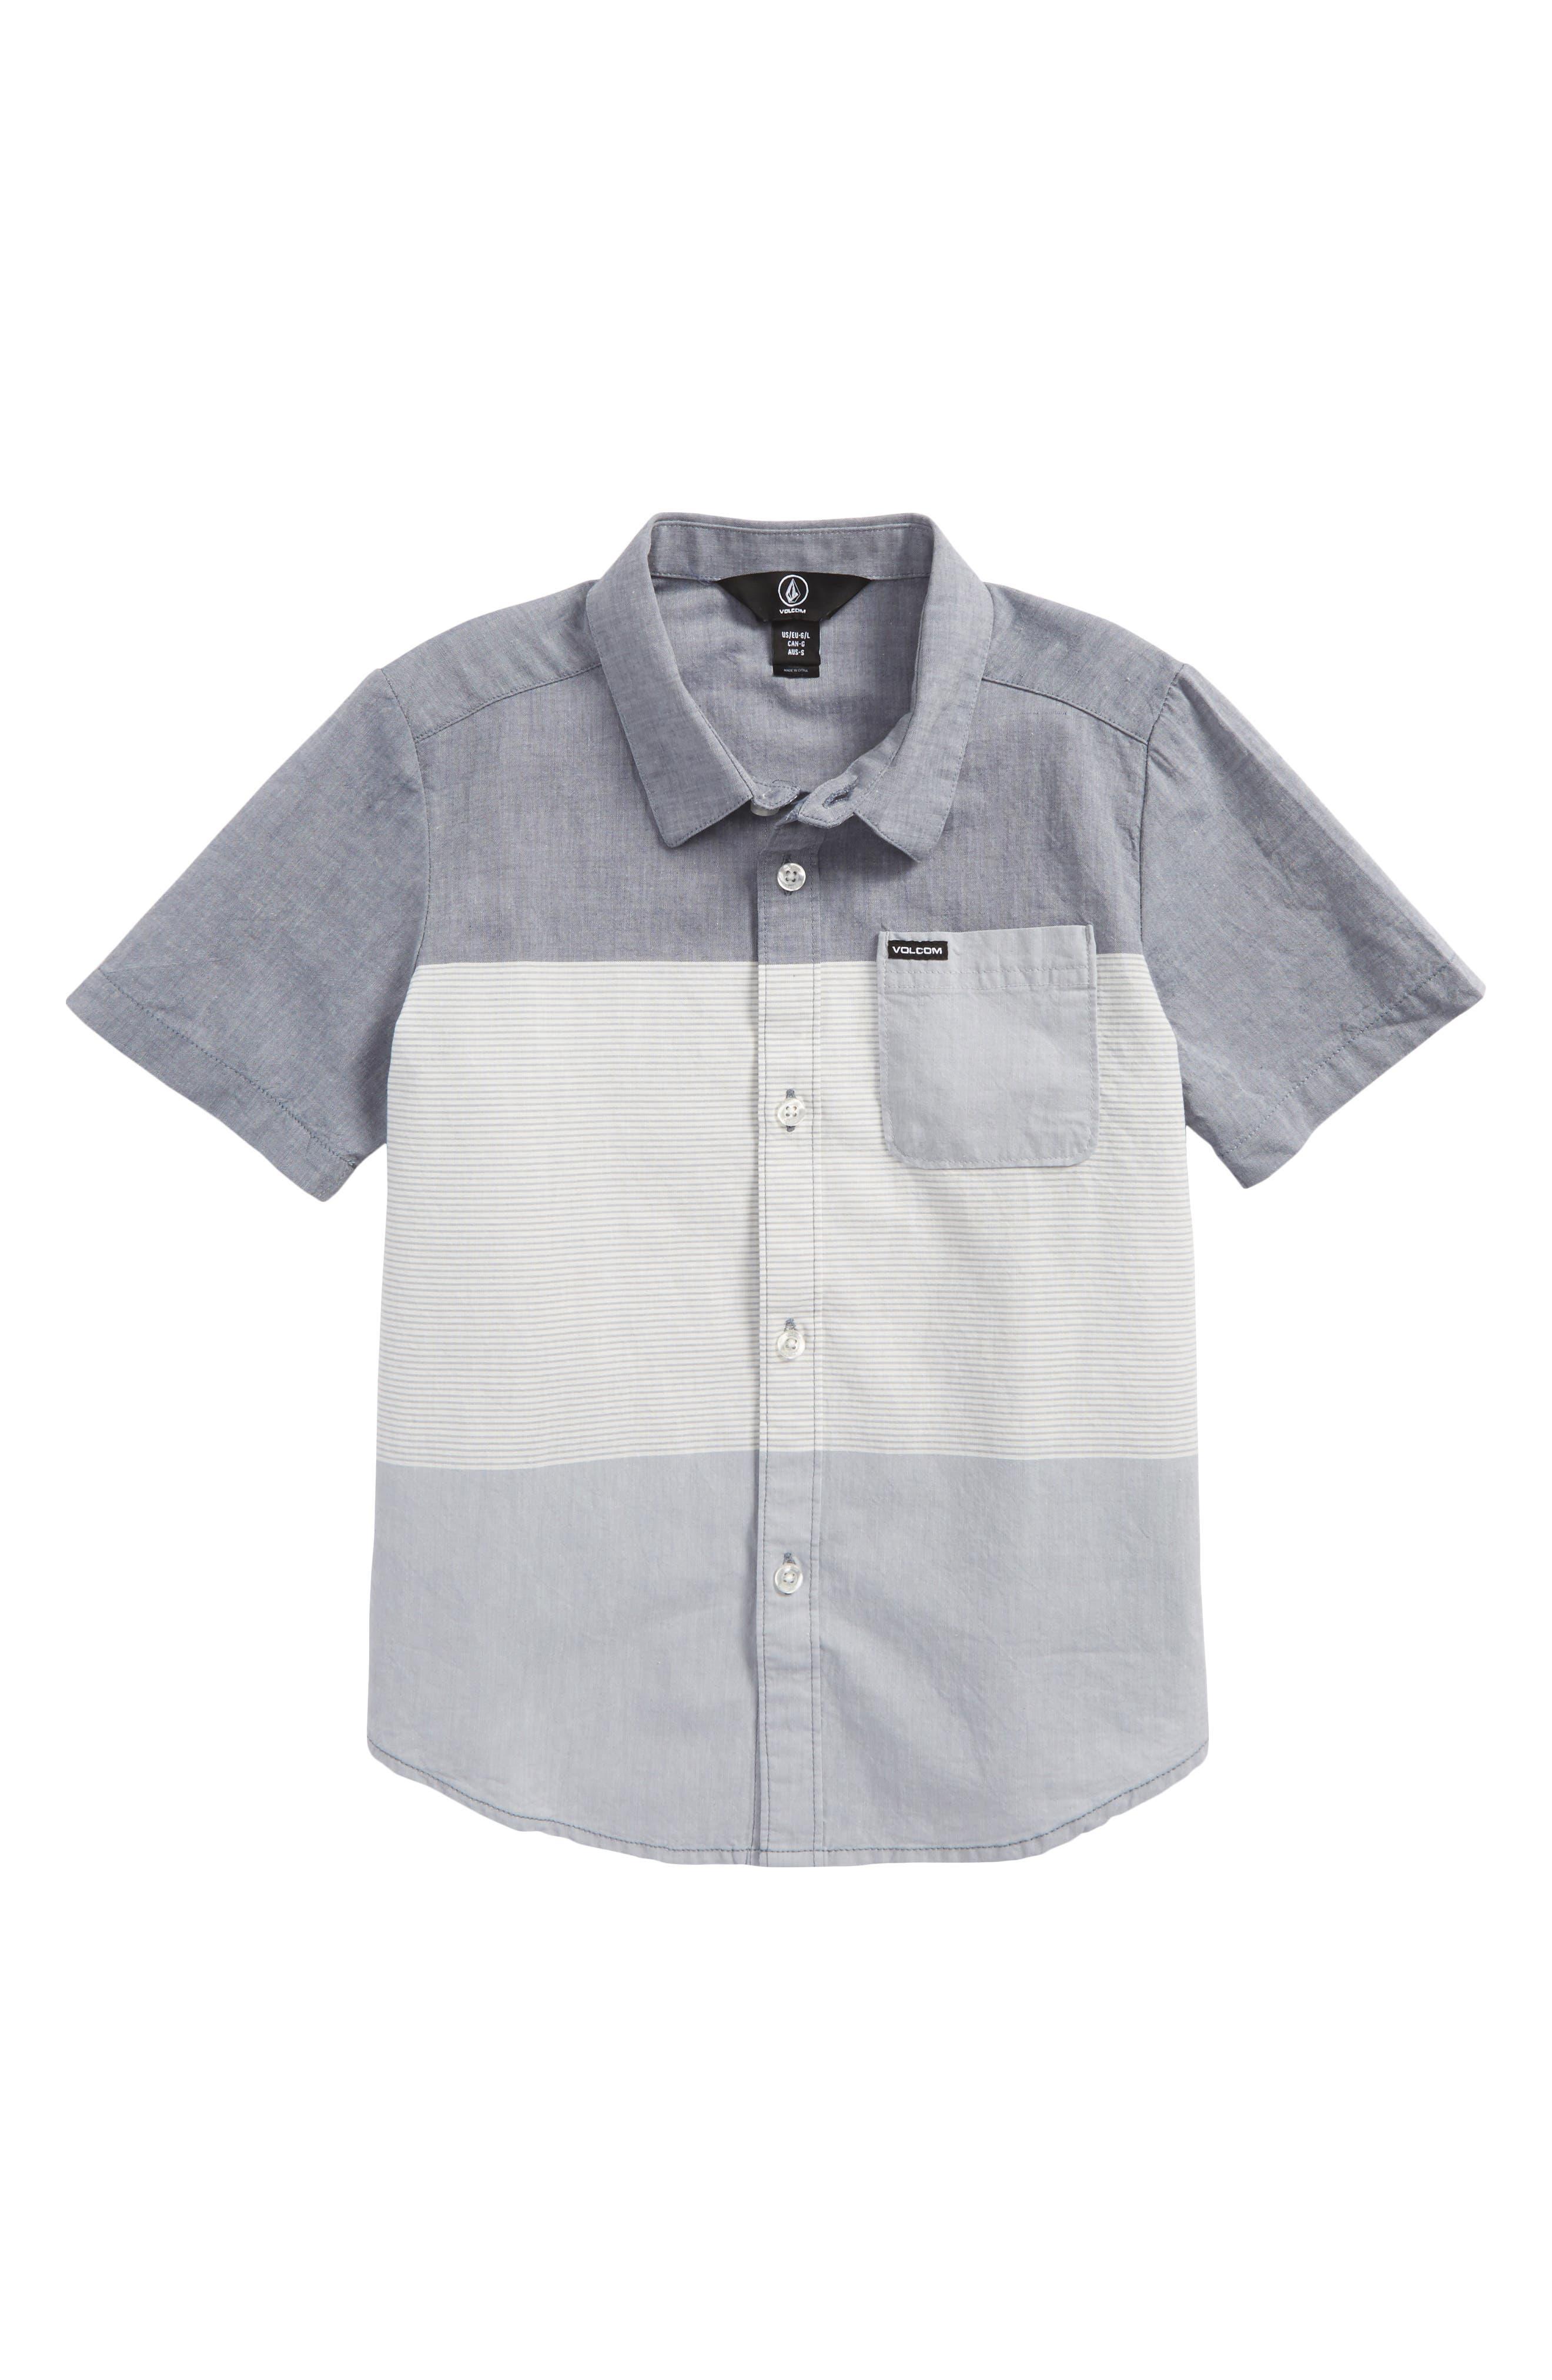 Crestone Woven Shirt,                             Main thumbnail 1, color,                             Deep Blue